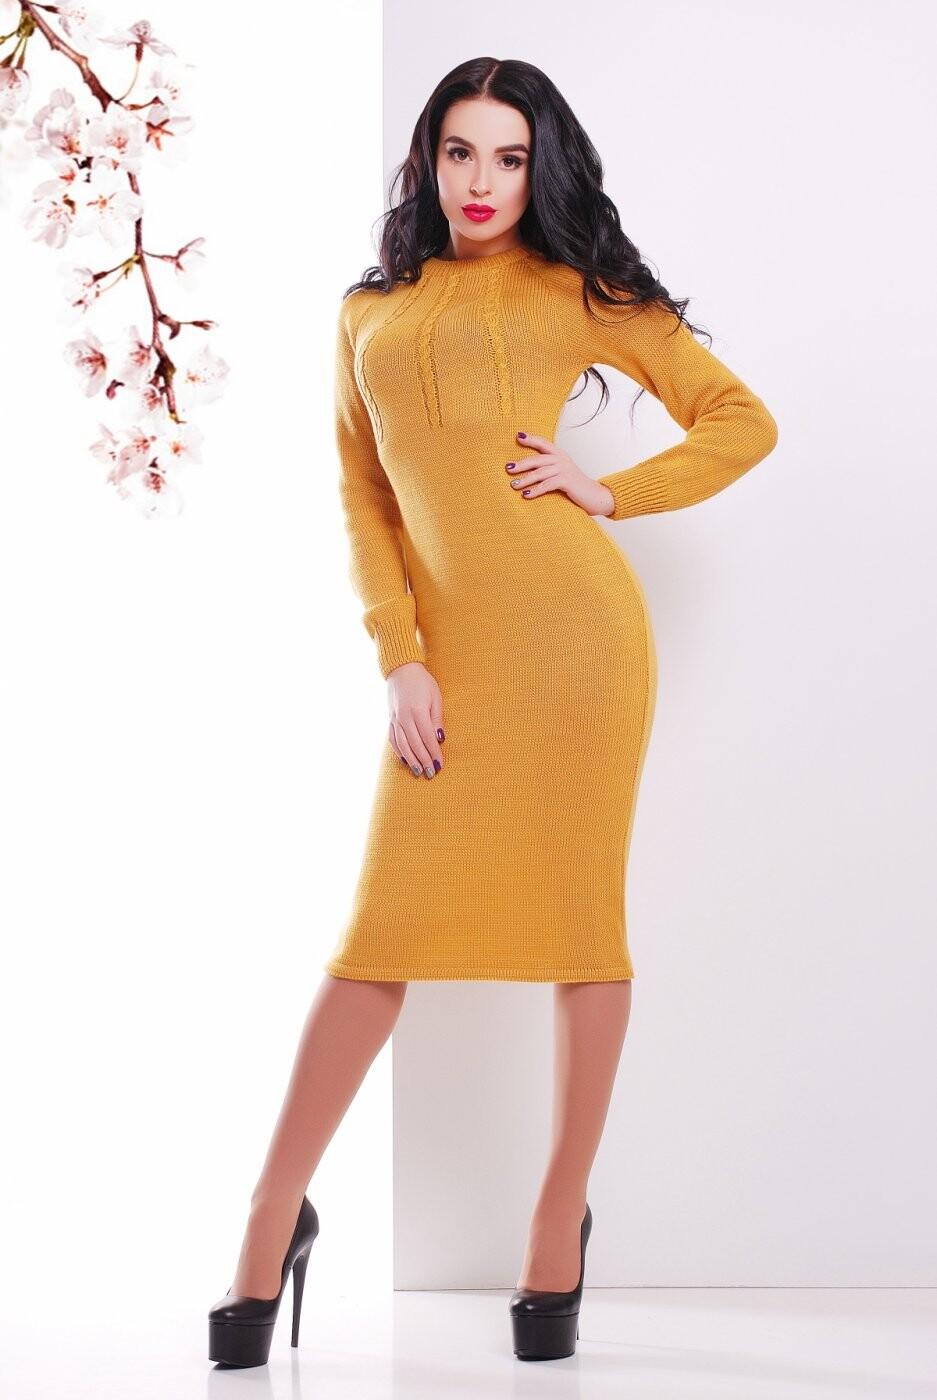 Вязаное Платье 137 горчица от MarSe, цвет горчица